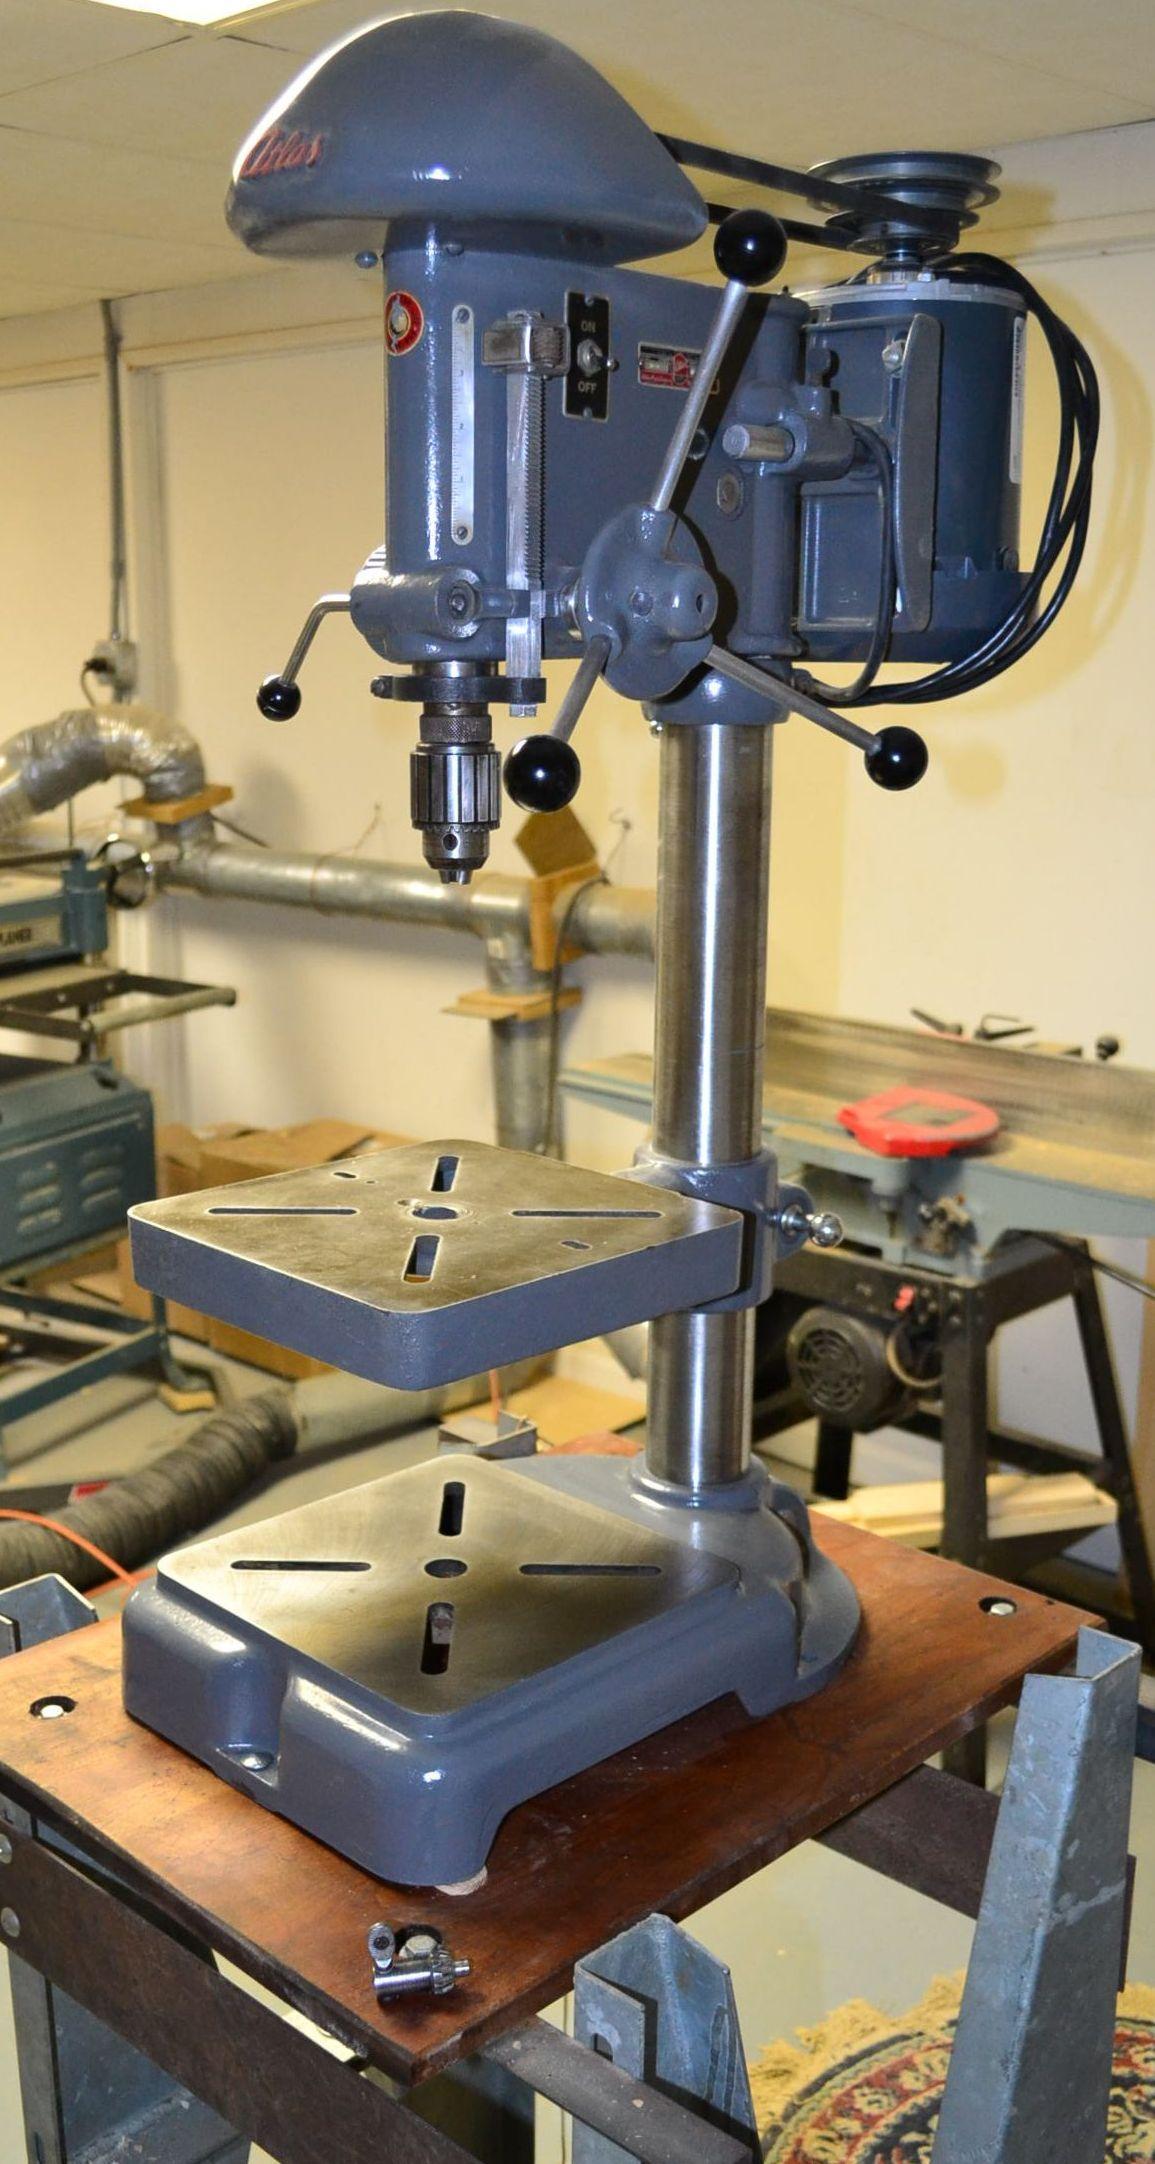 Atlas drill press Drill press, Antique tools, Kitchen